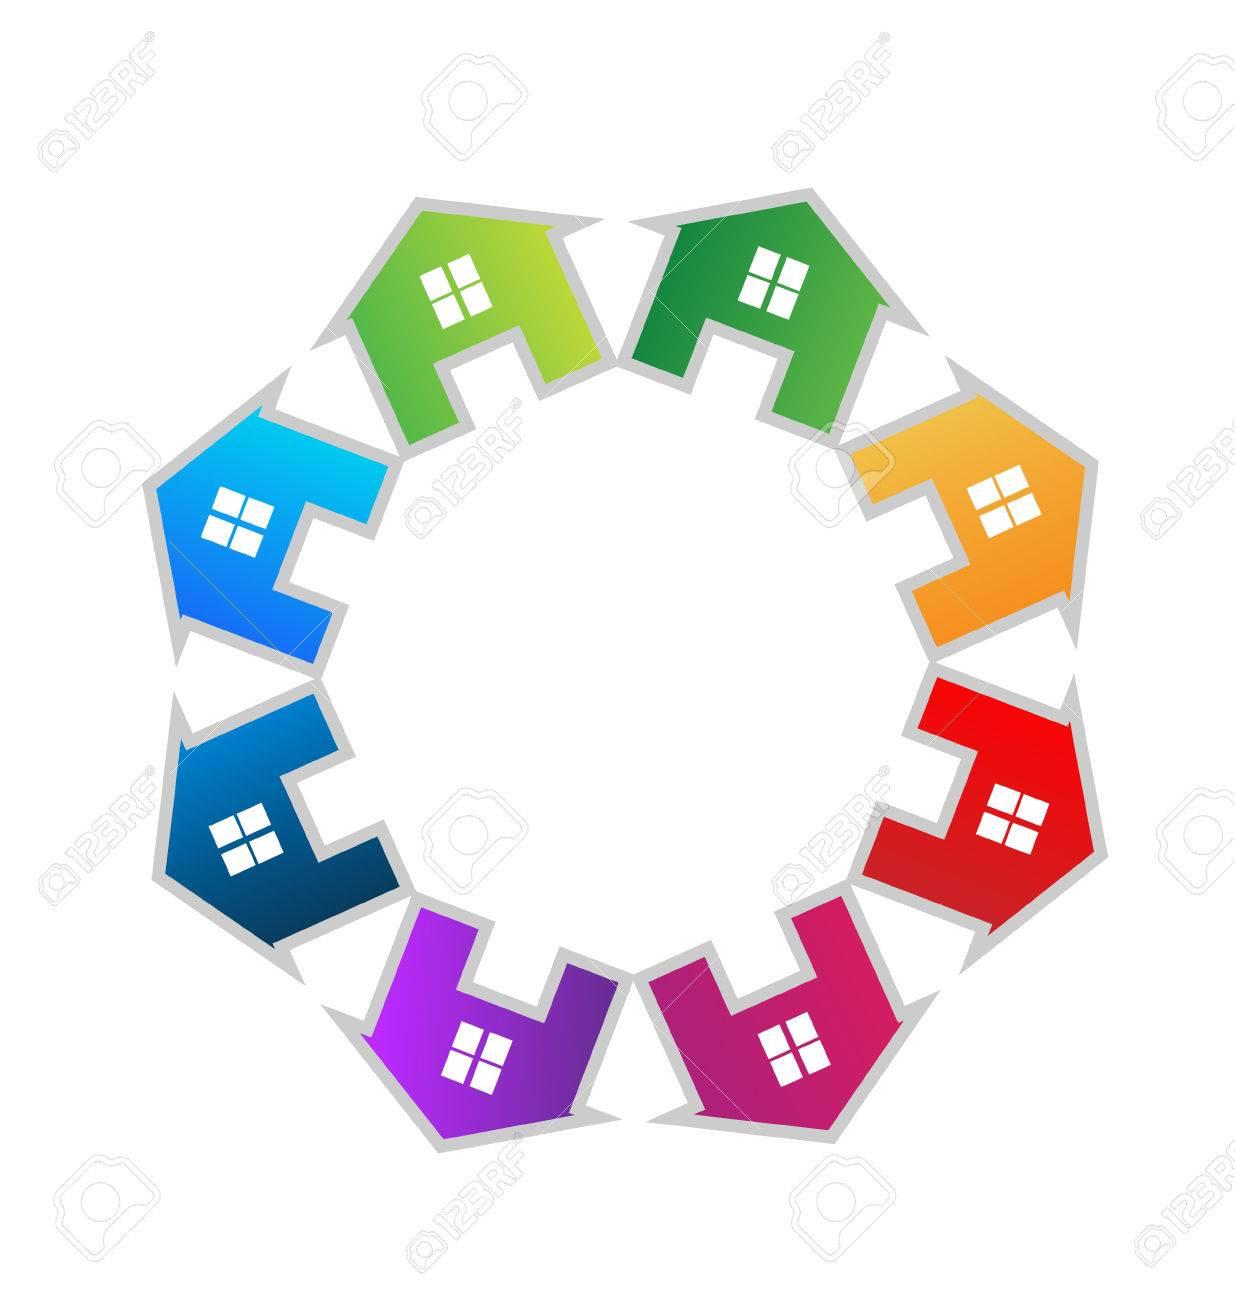 Teamwork houses icon vector Stock Vector - 22801556